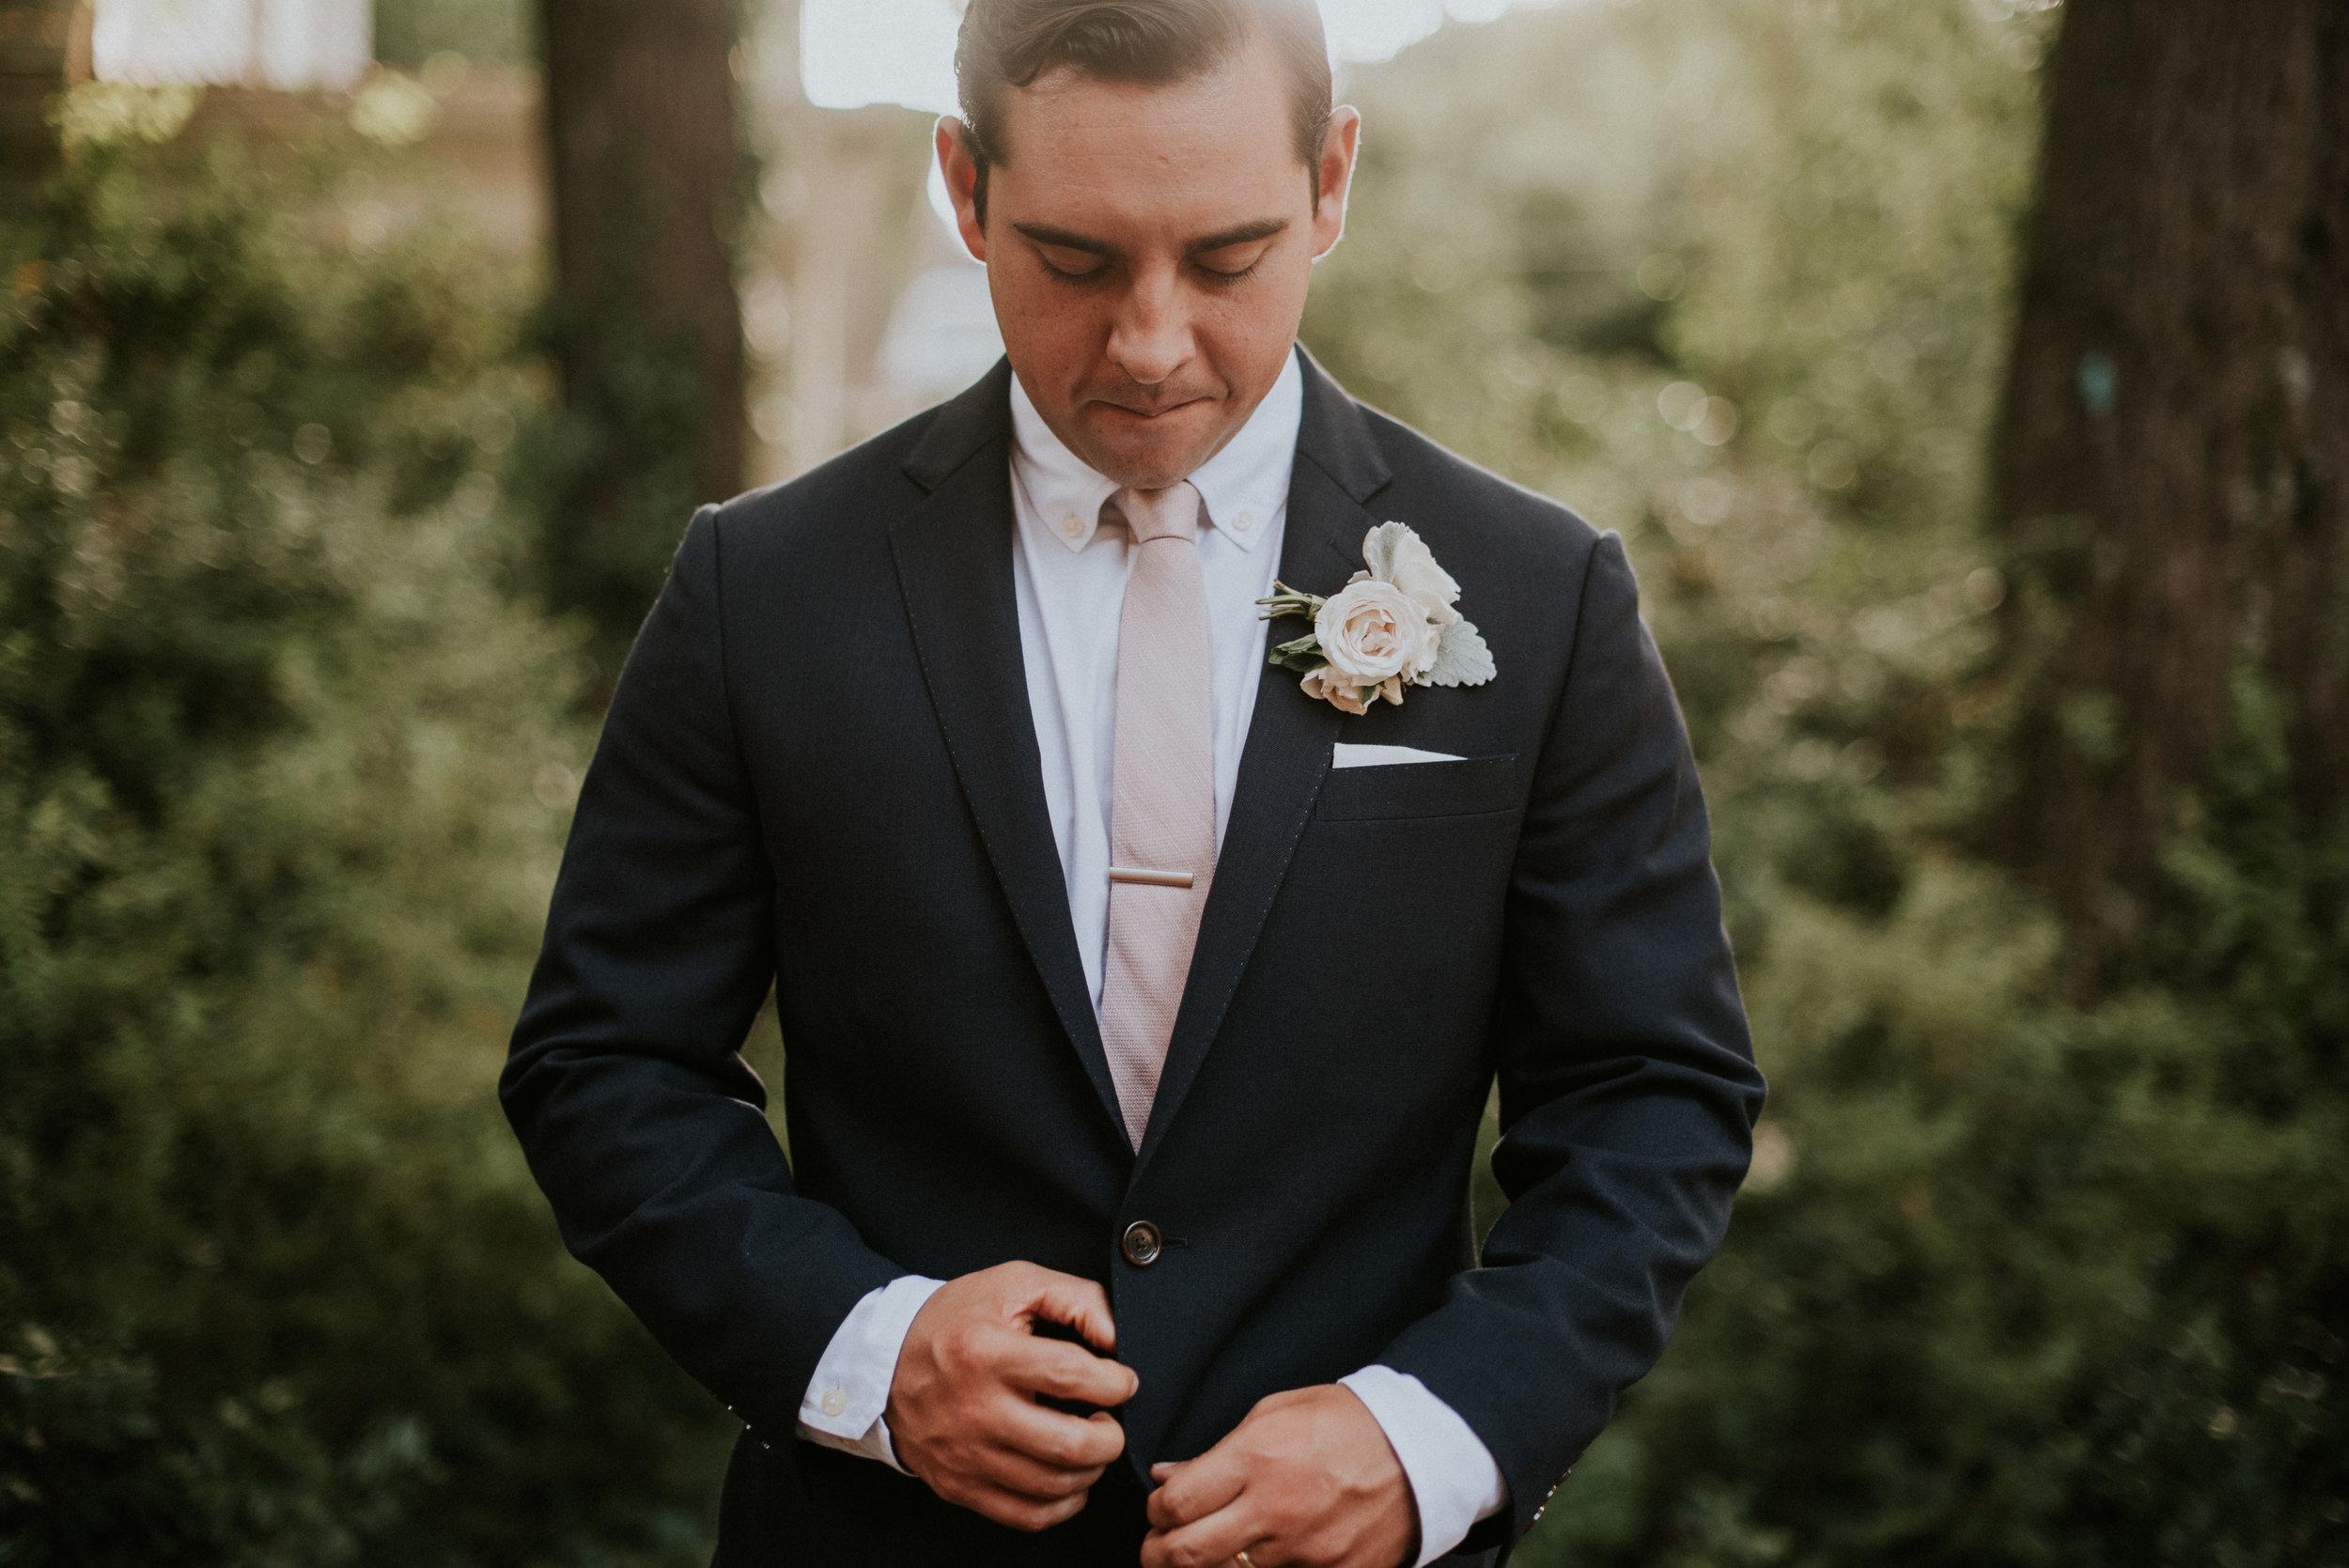 Portrait of groom buttoning navy suit jacket